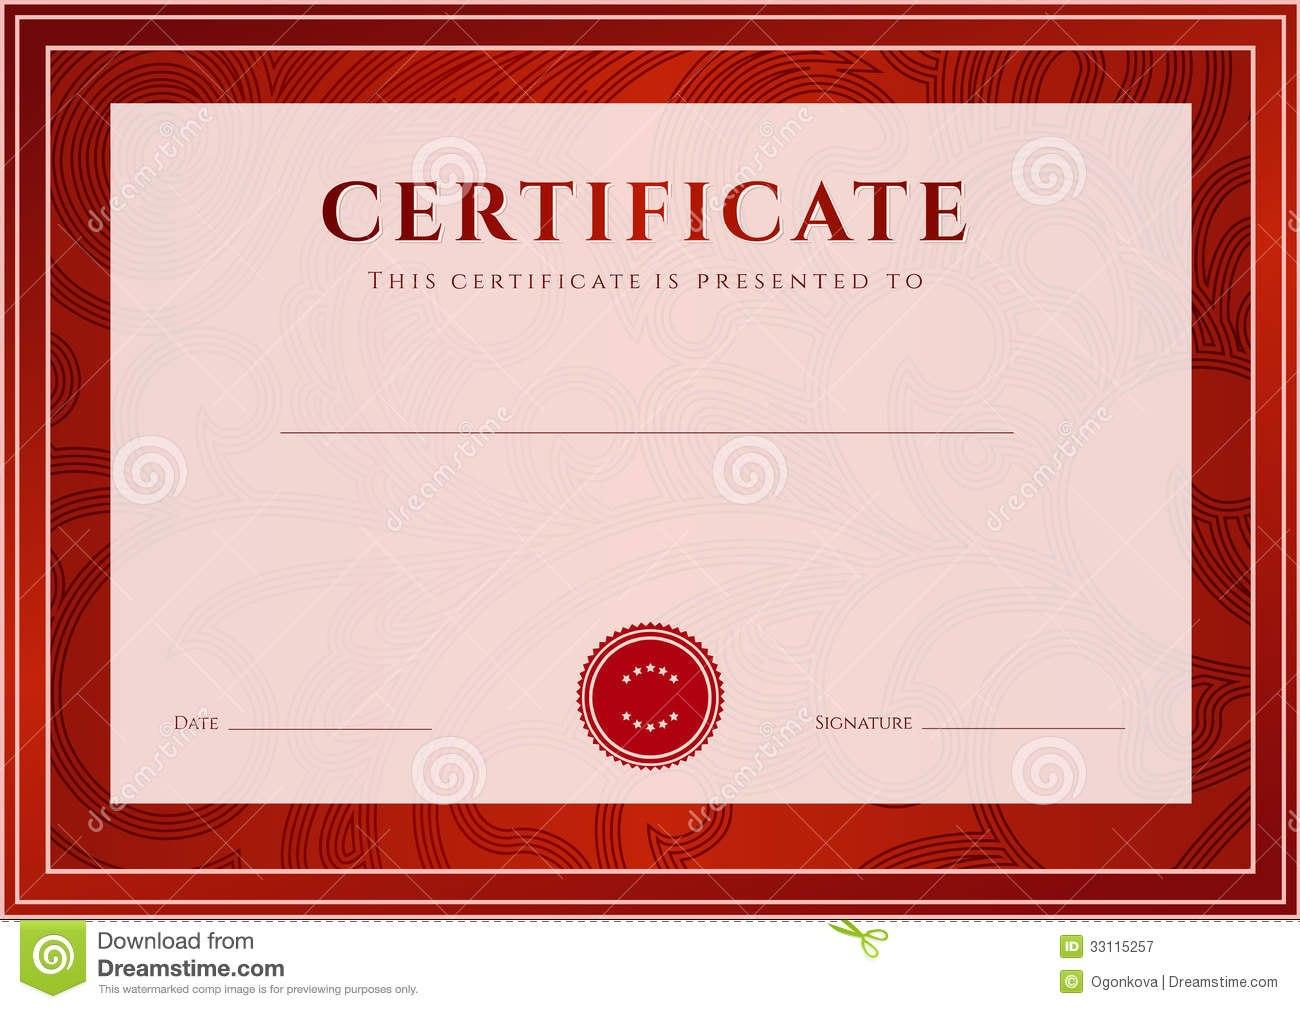 Samplediplomaofgraduationcertificatetemplatesnew Within Free Printable Graduation Certificate Templates